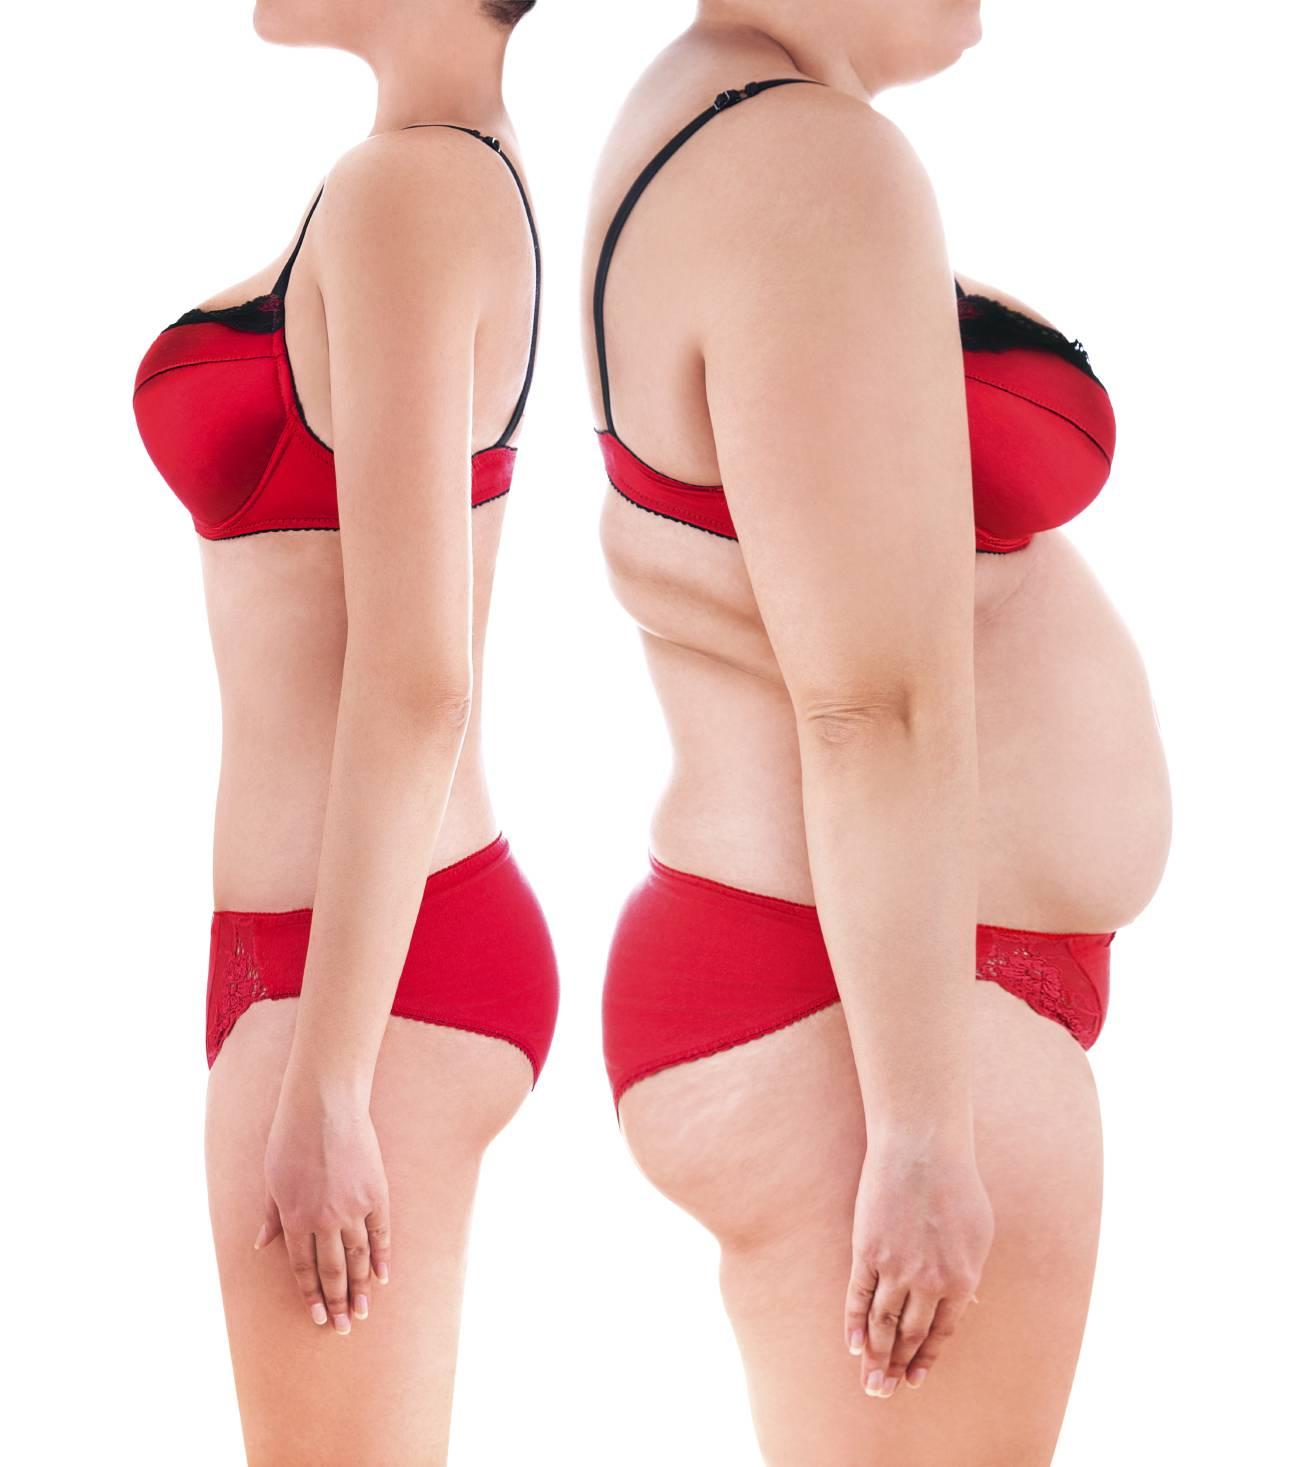 dieta bilanciata per perdere 10 kg